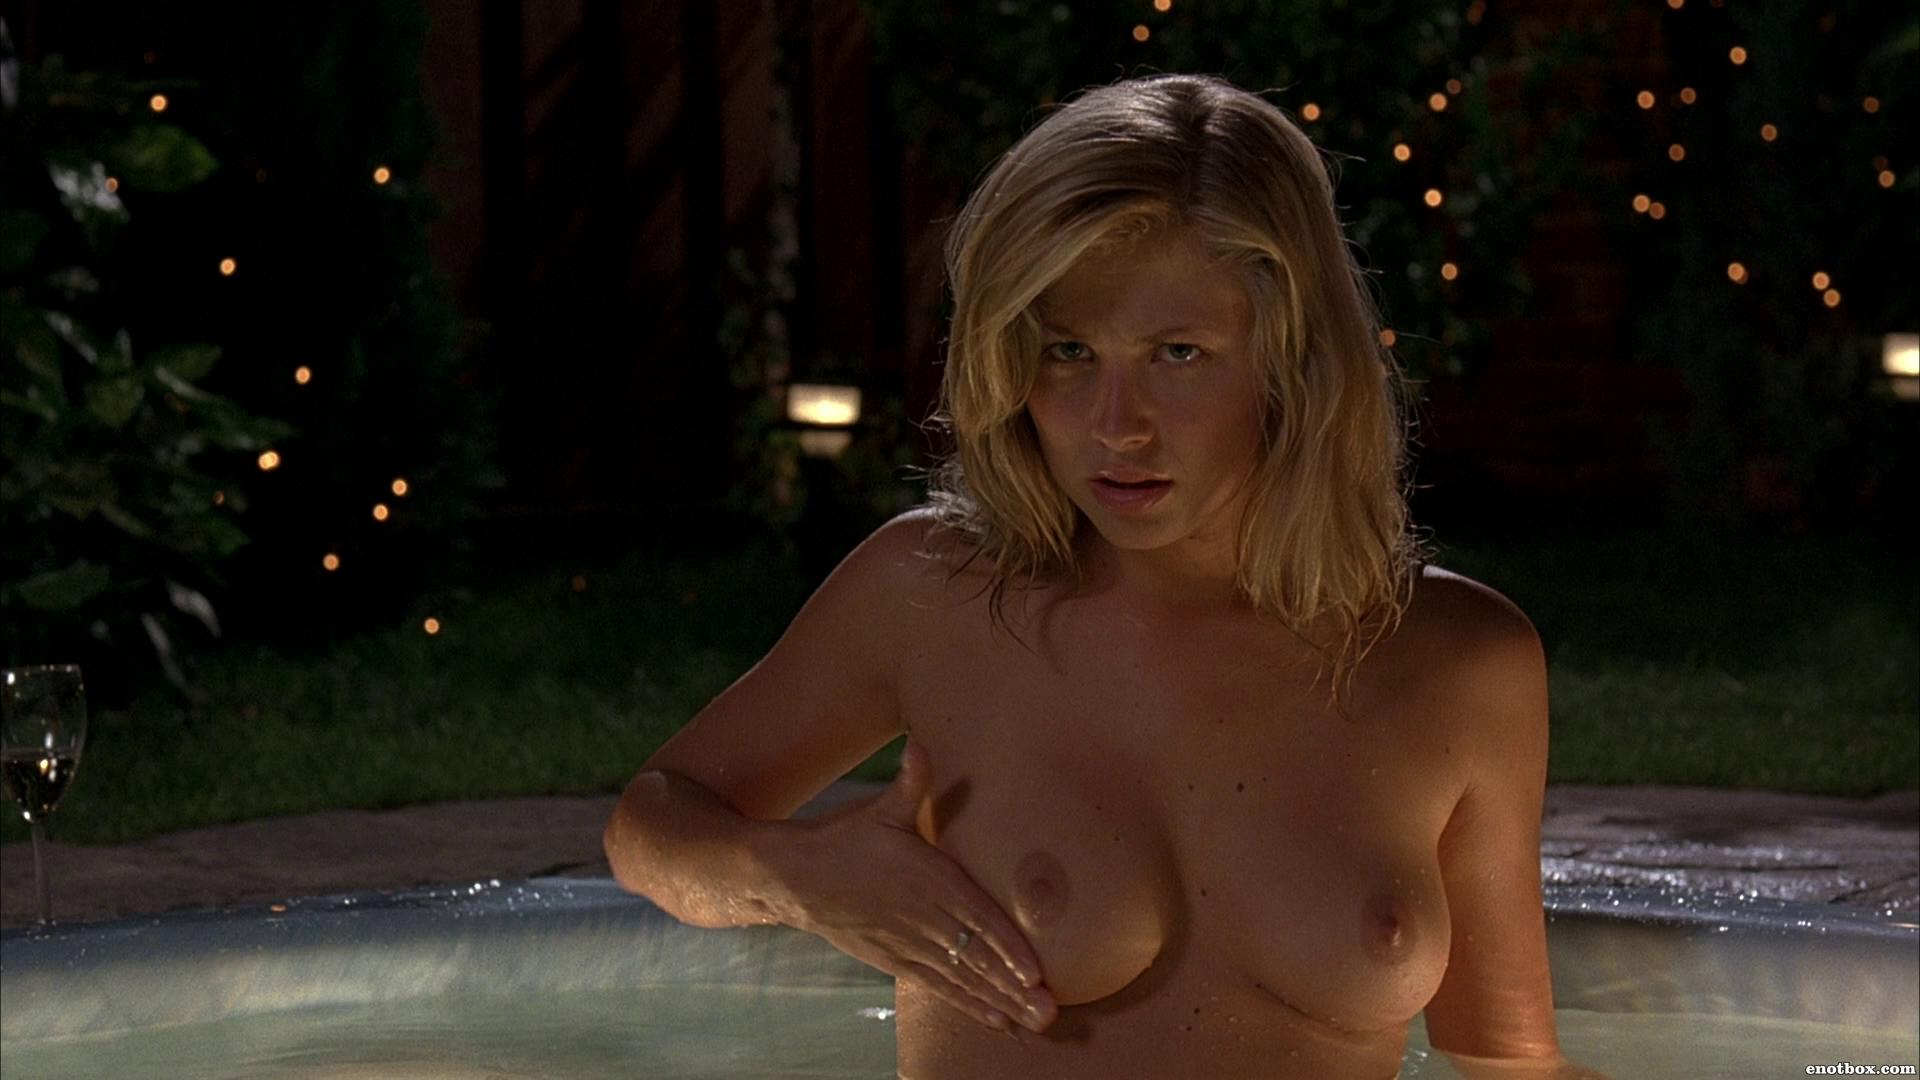 Jessica robertson topless